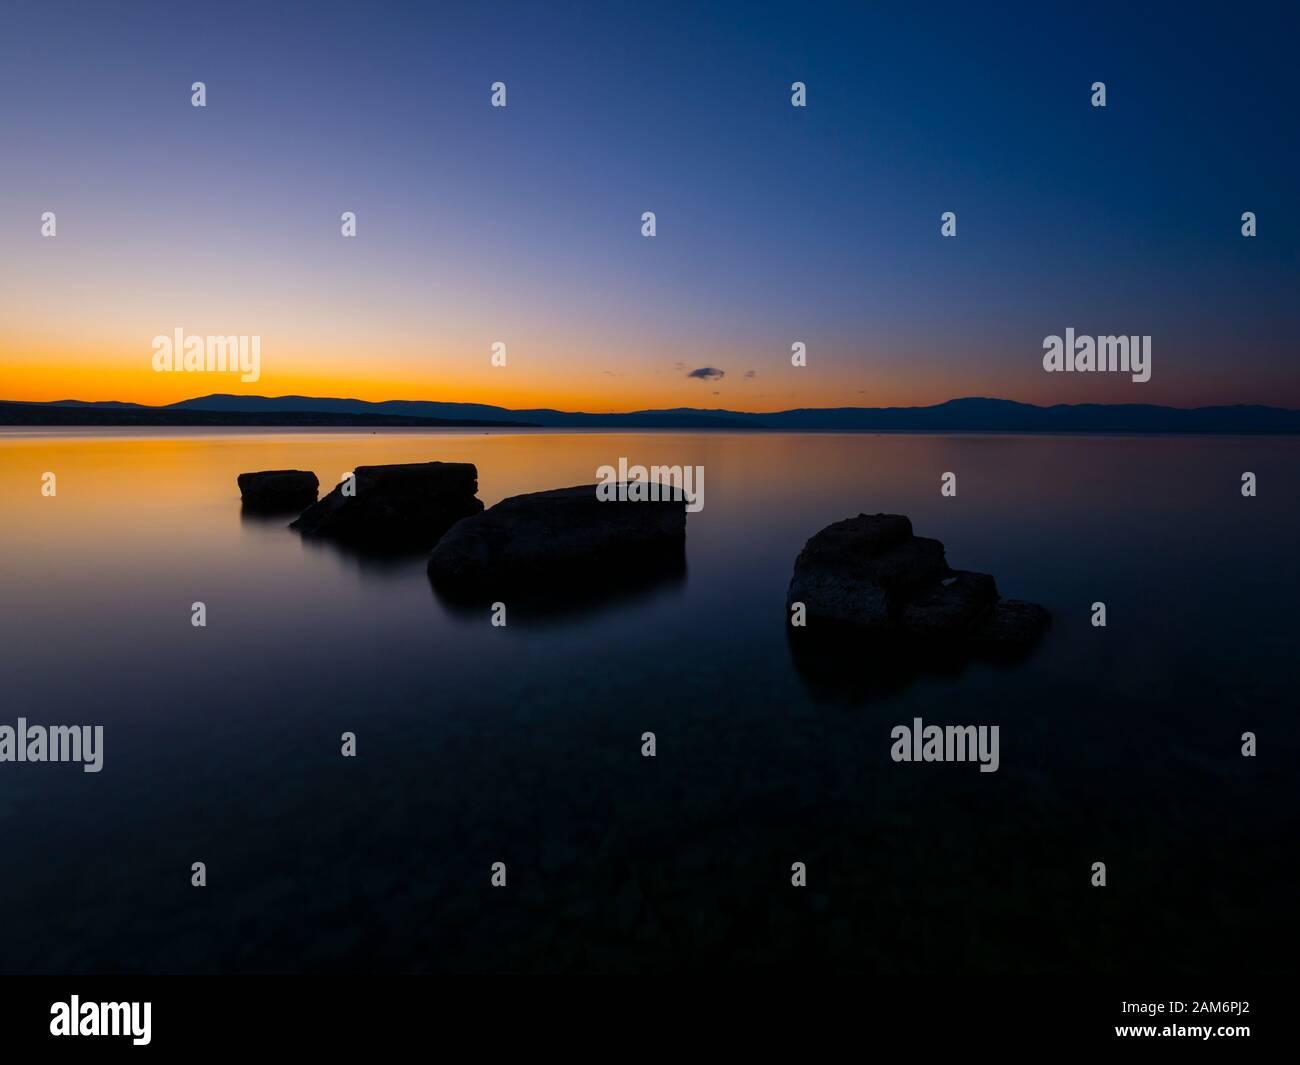 Sunset serene scenery rocks on calm sea surface Malinska on island Krk in Croatia Europe Stock Photo